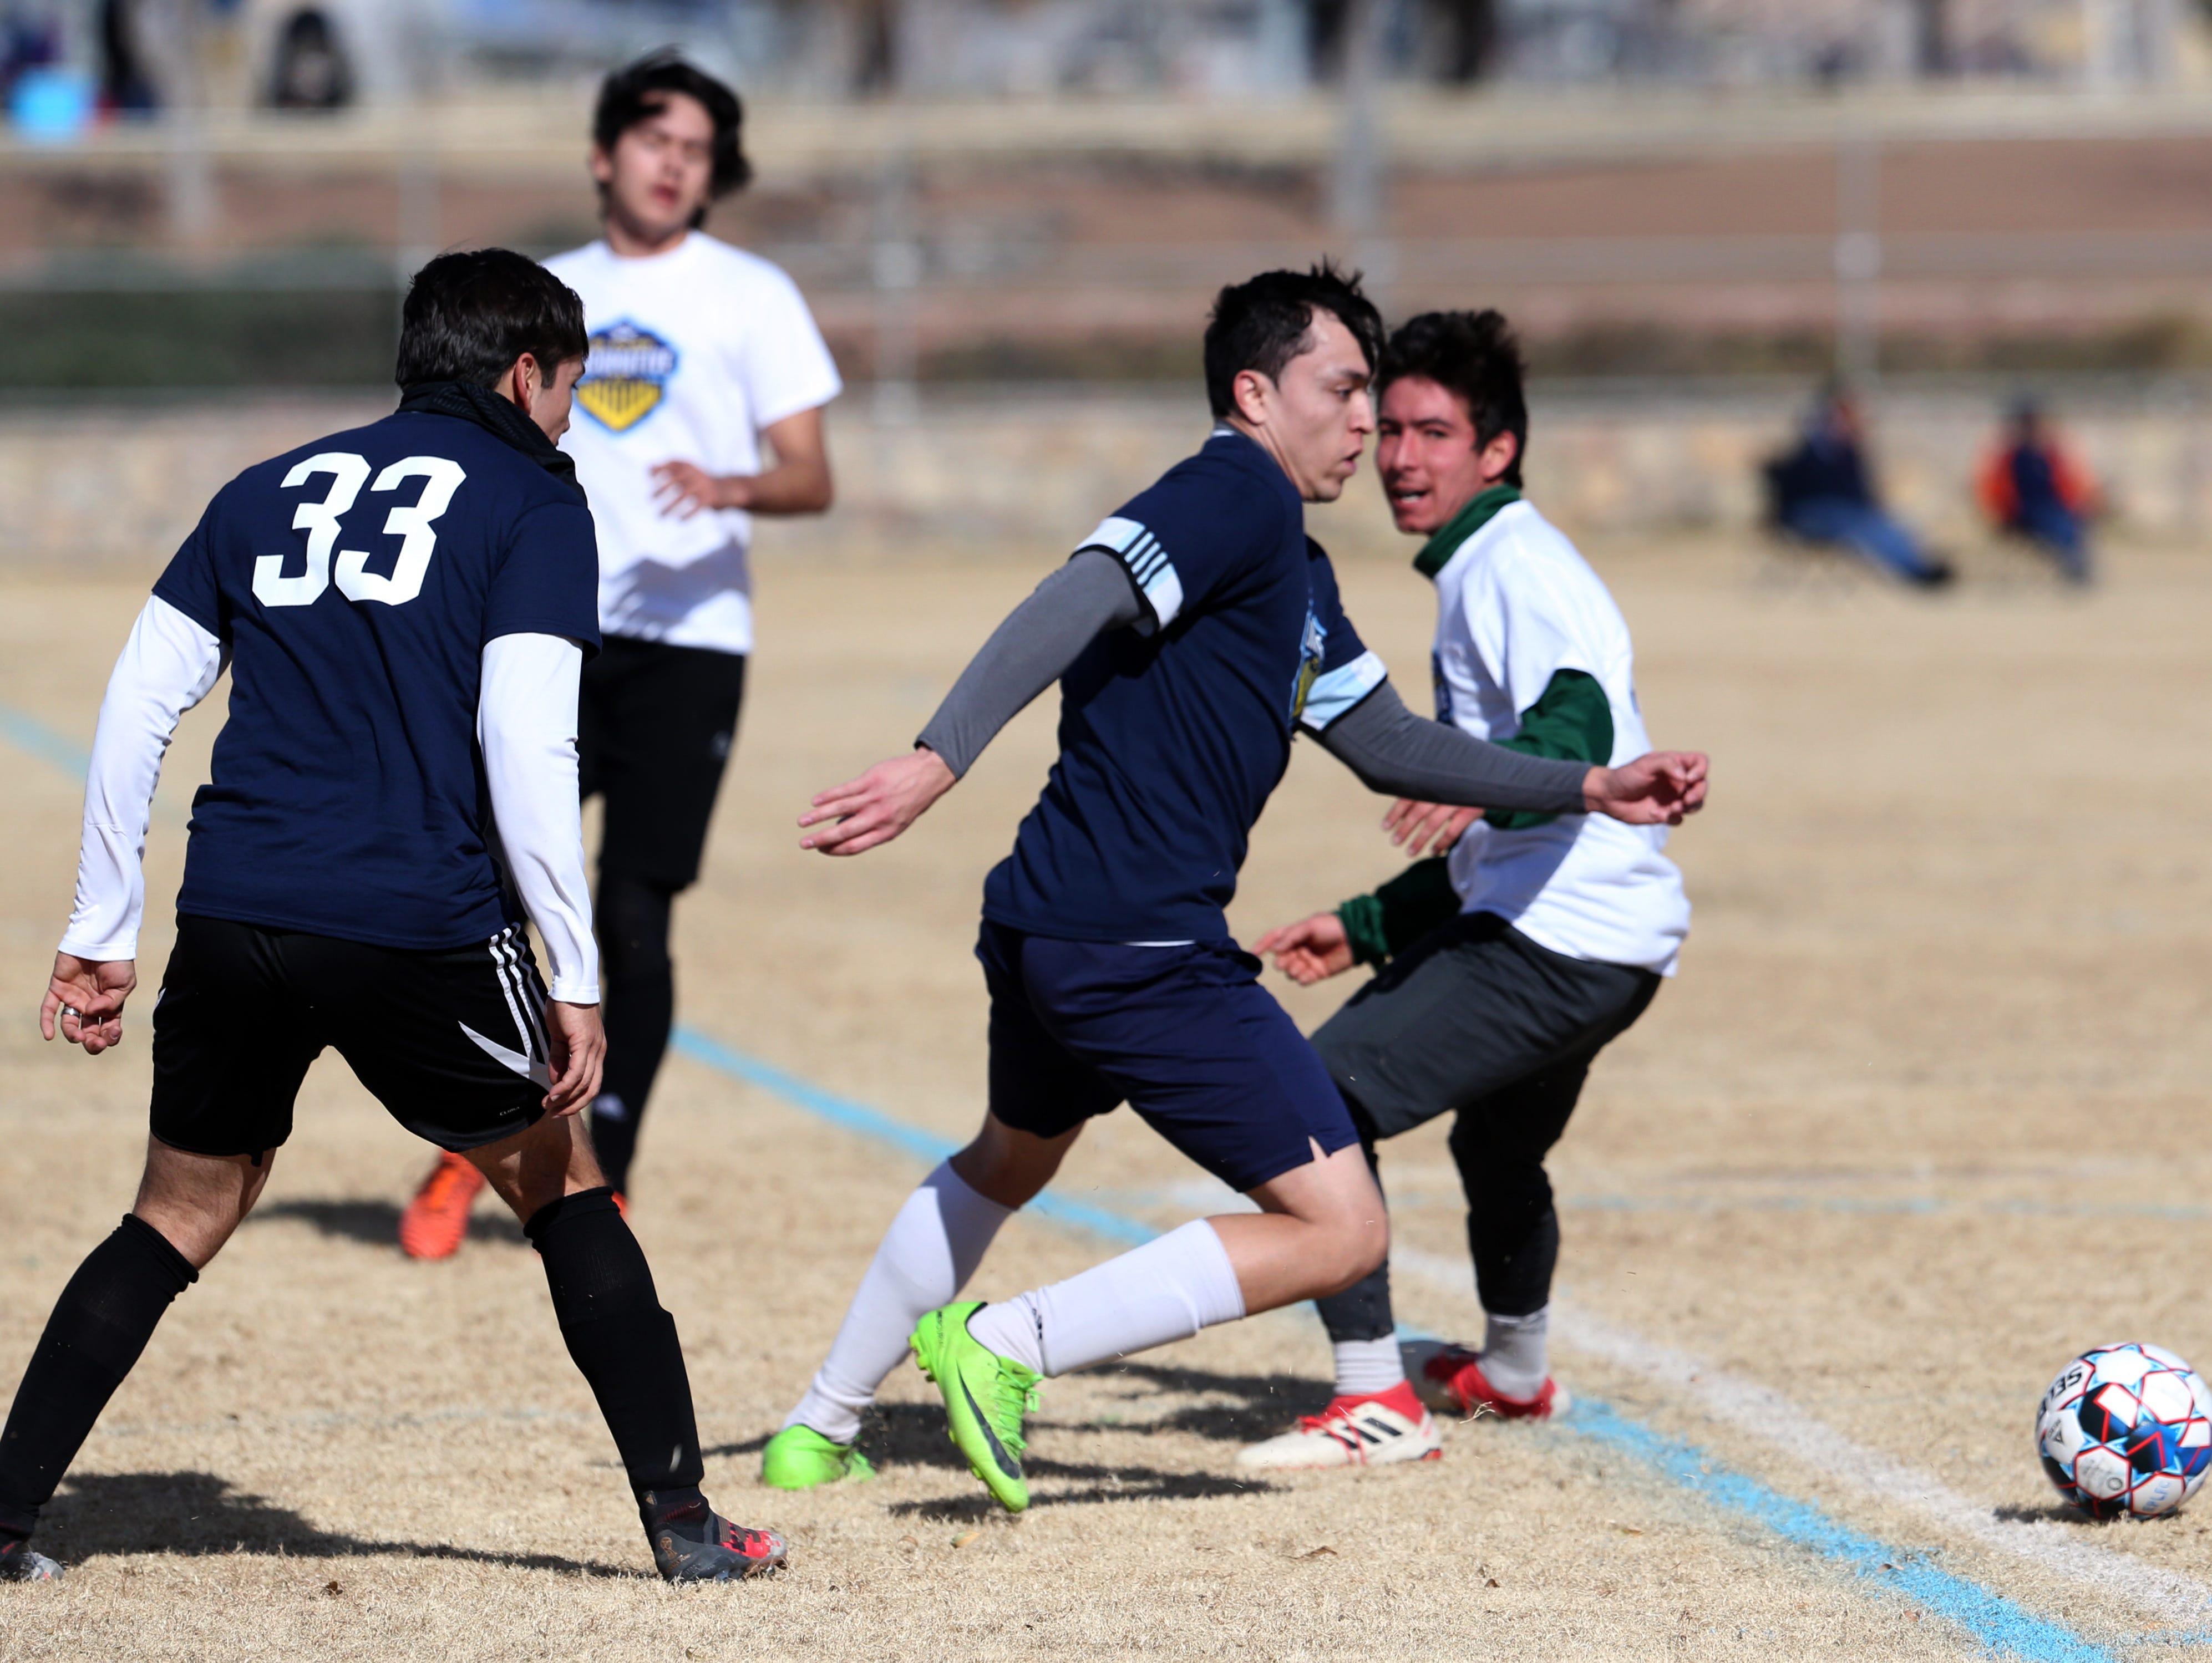 El Paso Locomotive FC sign Spain's 'Yuma' as team's ninth player